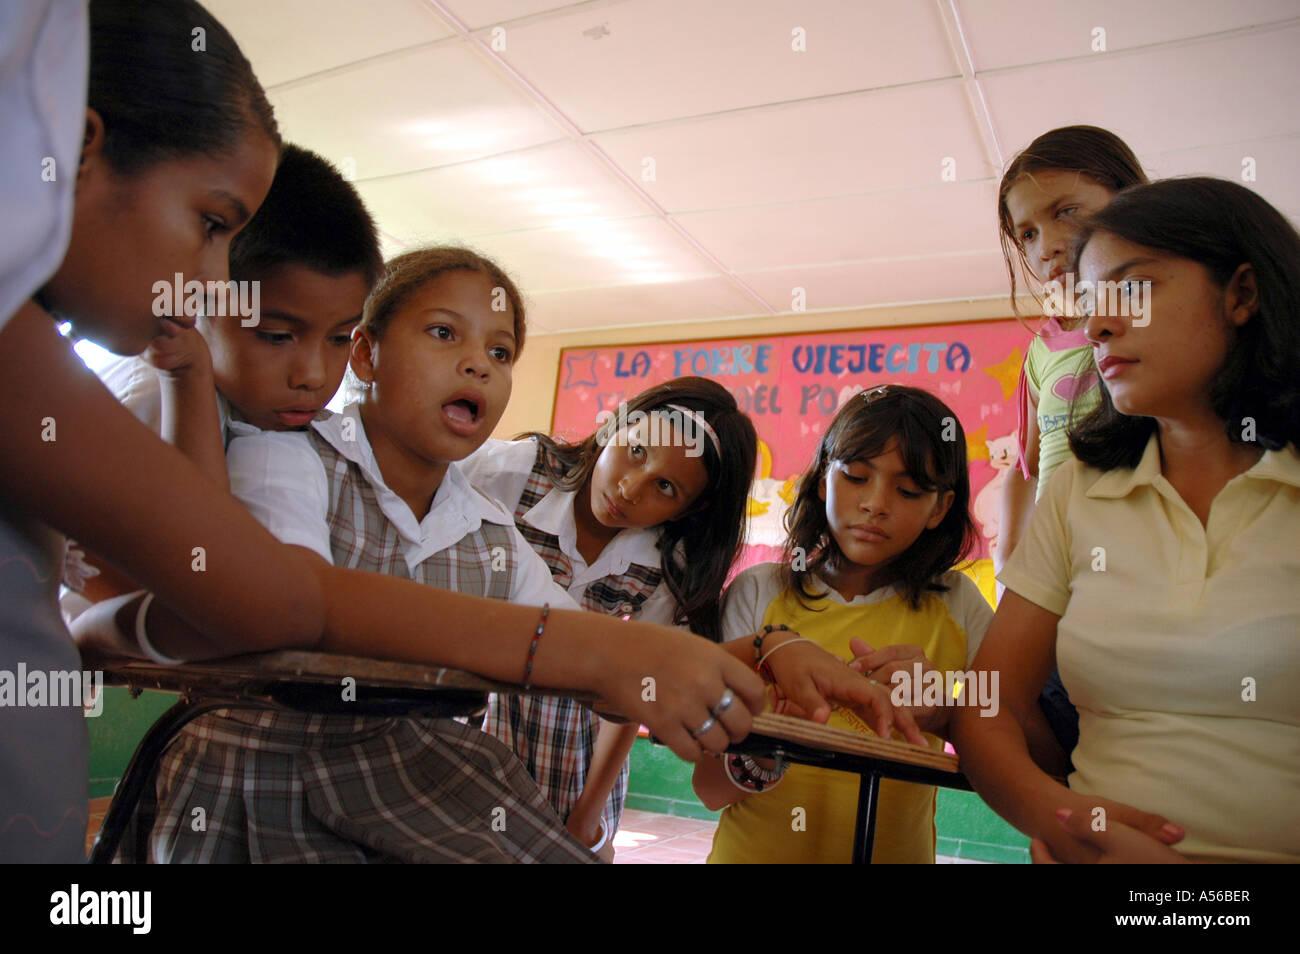 Painet iy8259 children kids female teacher colombia extracurricular seminar middle school paz barrancabermeja discuss - Stock Image